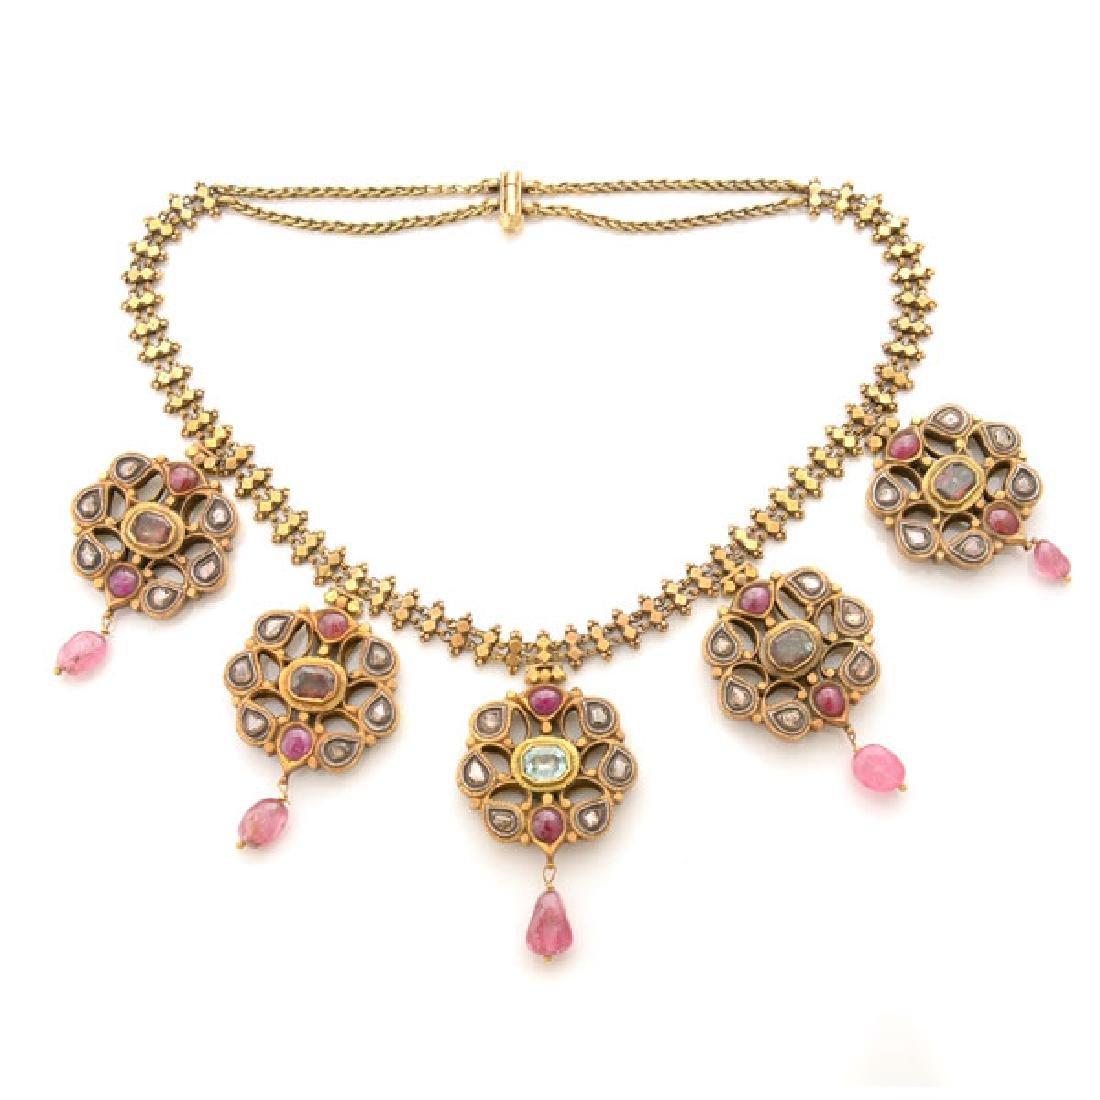 Tourmaline, Diamond, 18k Yellow Gold, Silver Necklace